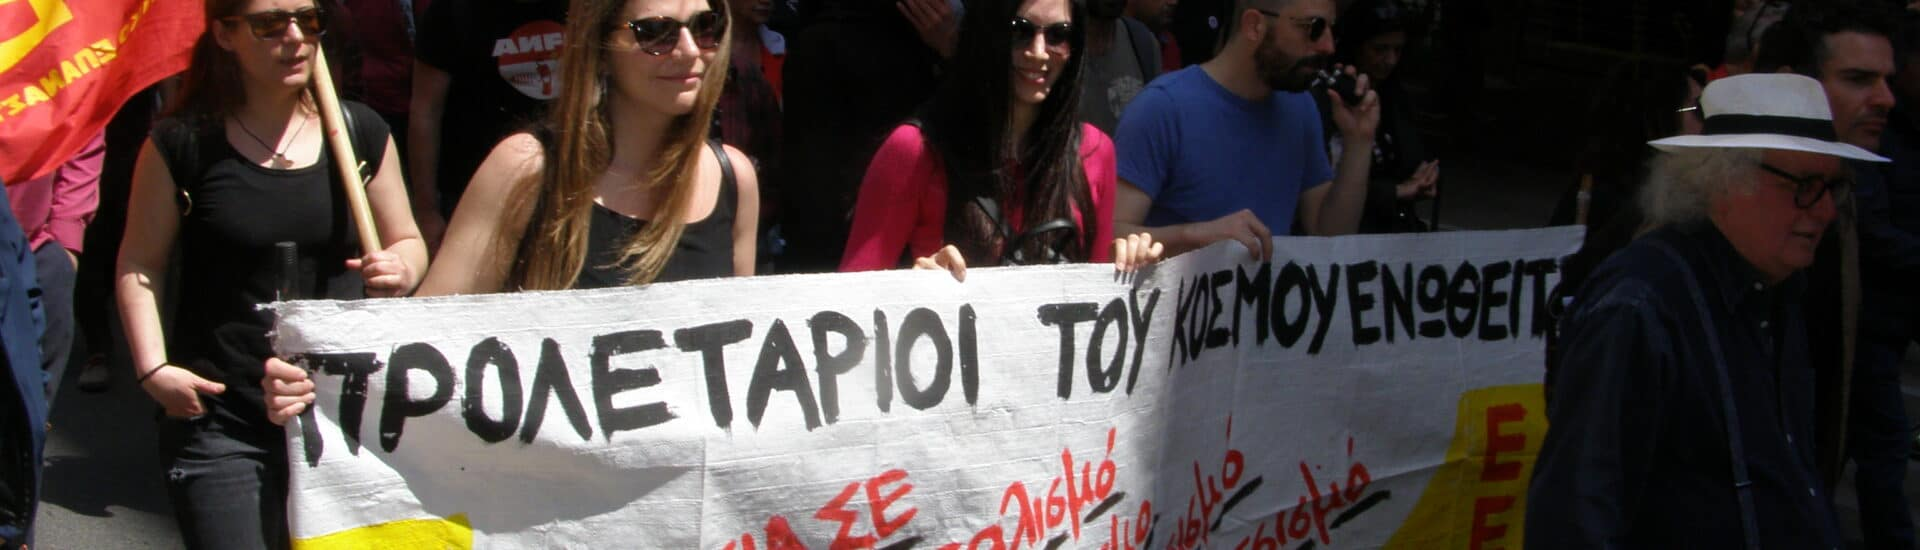 DIP-ΕΕΚ: Πόλεμος στον Πόλεμο  σε Αιγαίο και Μεσόγειο!